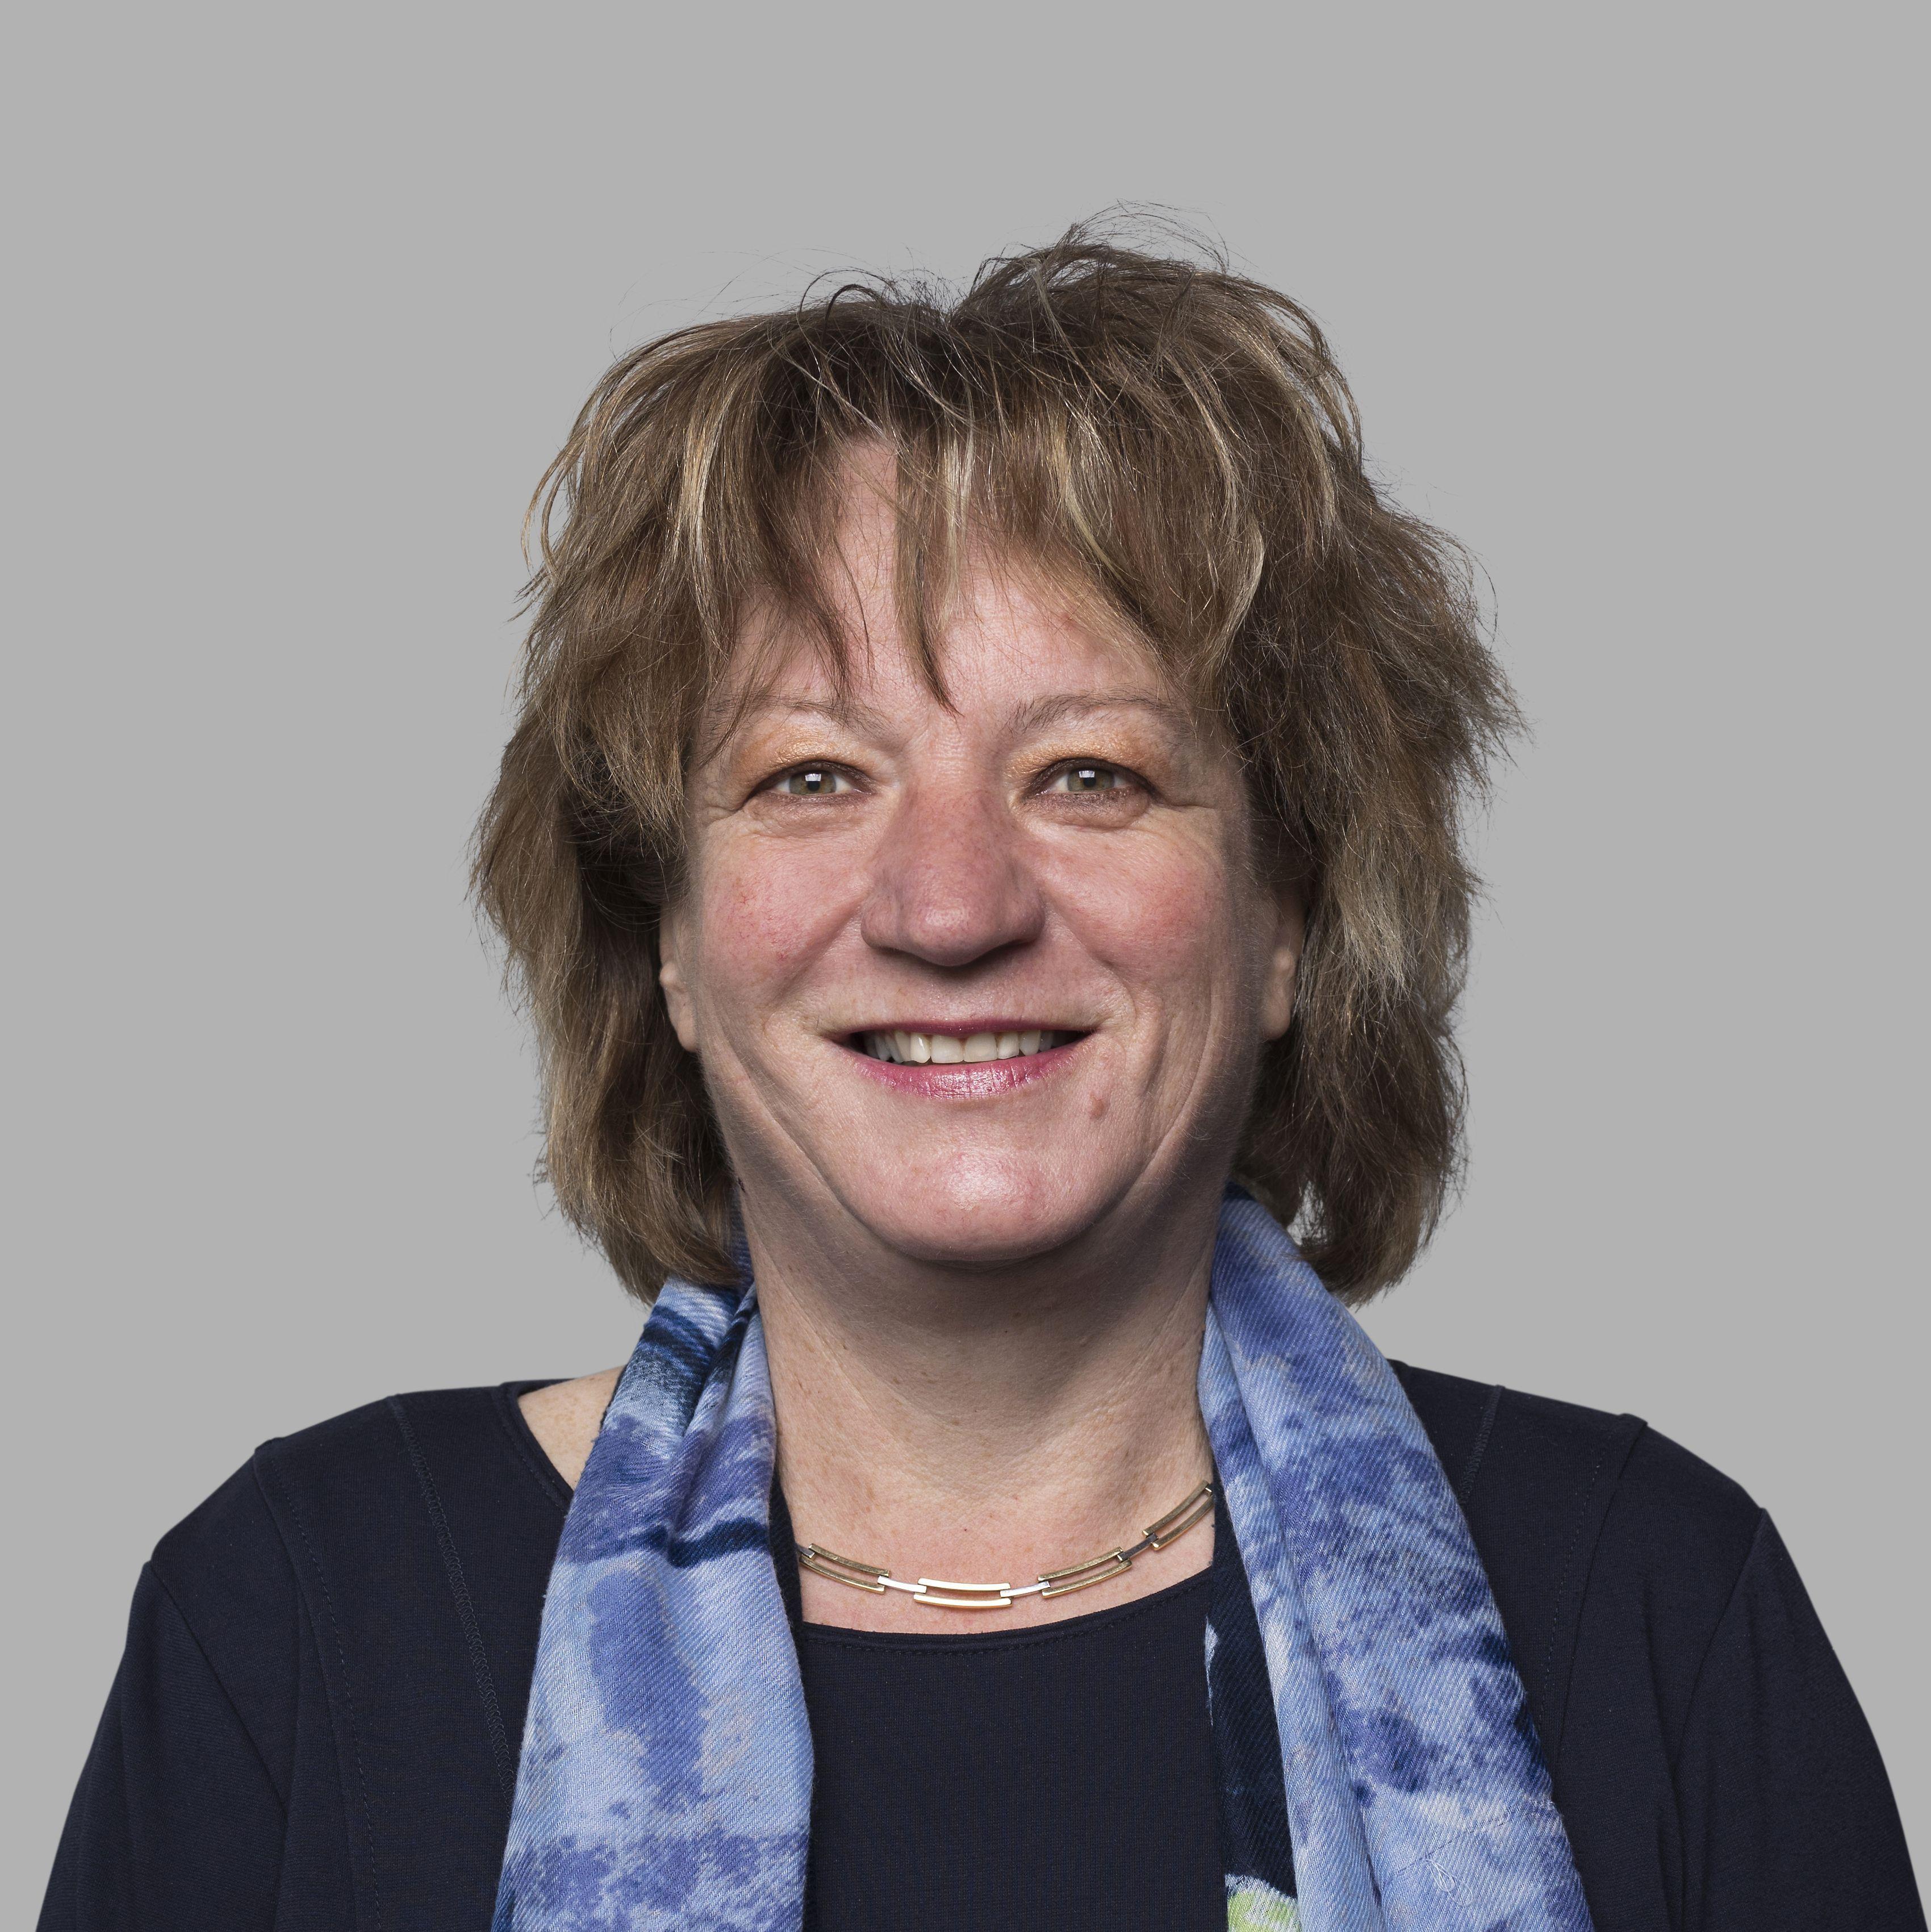 Anja van der Wurff